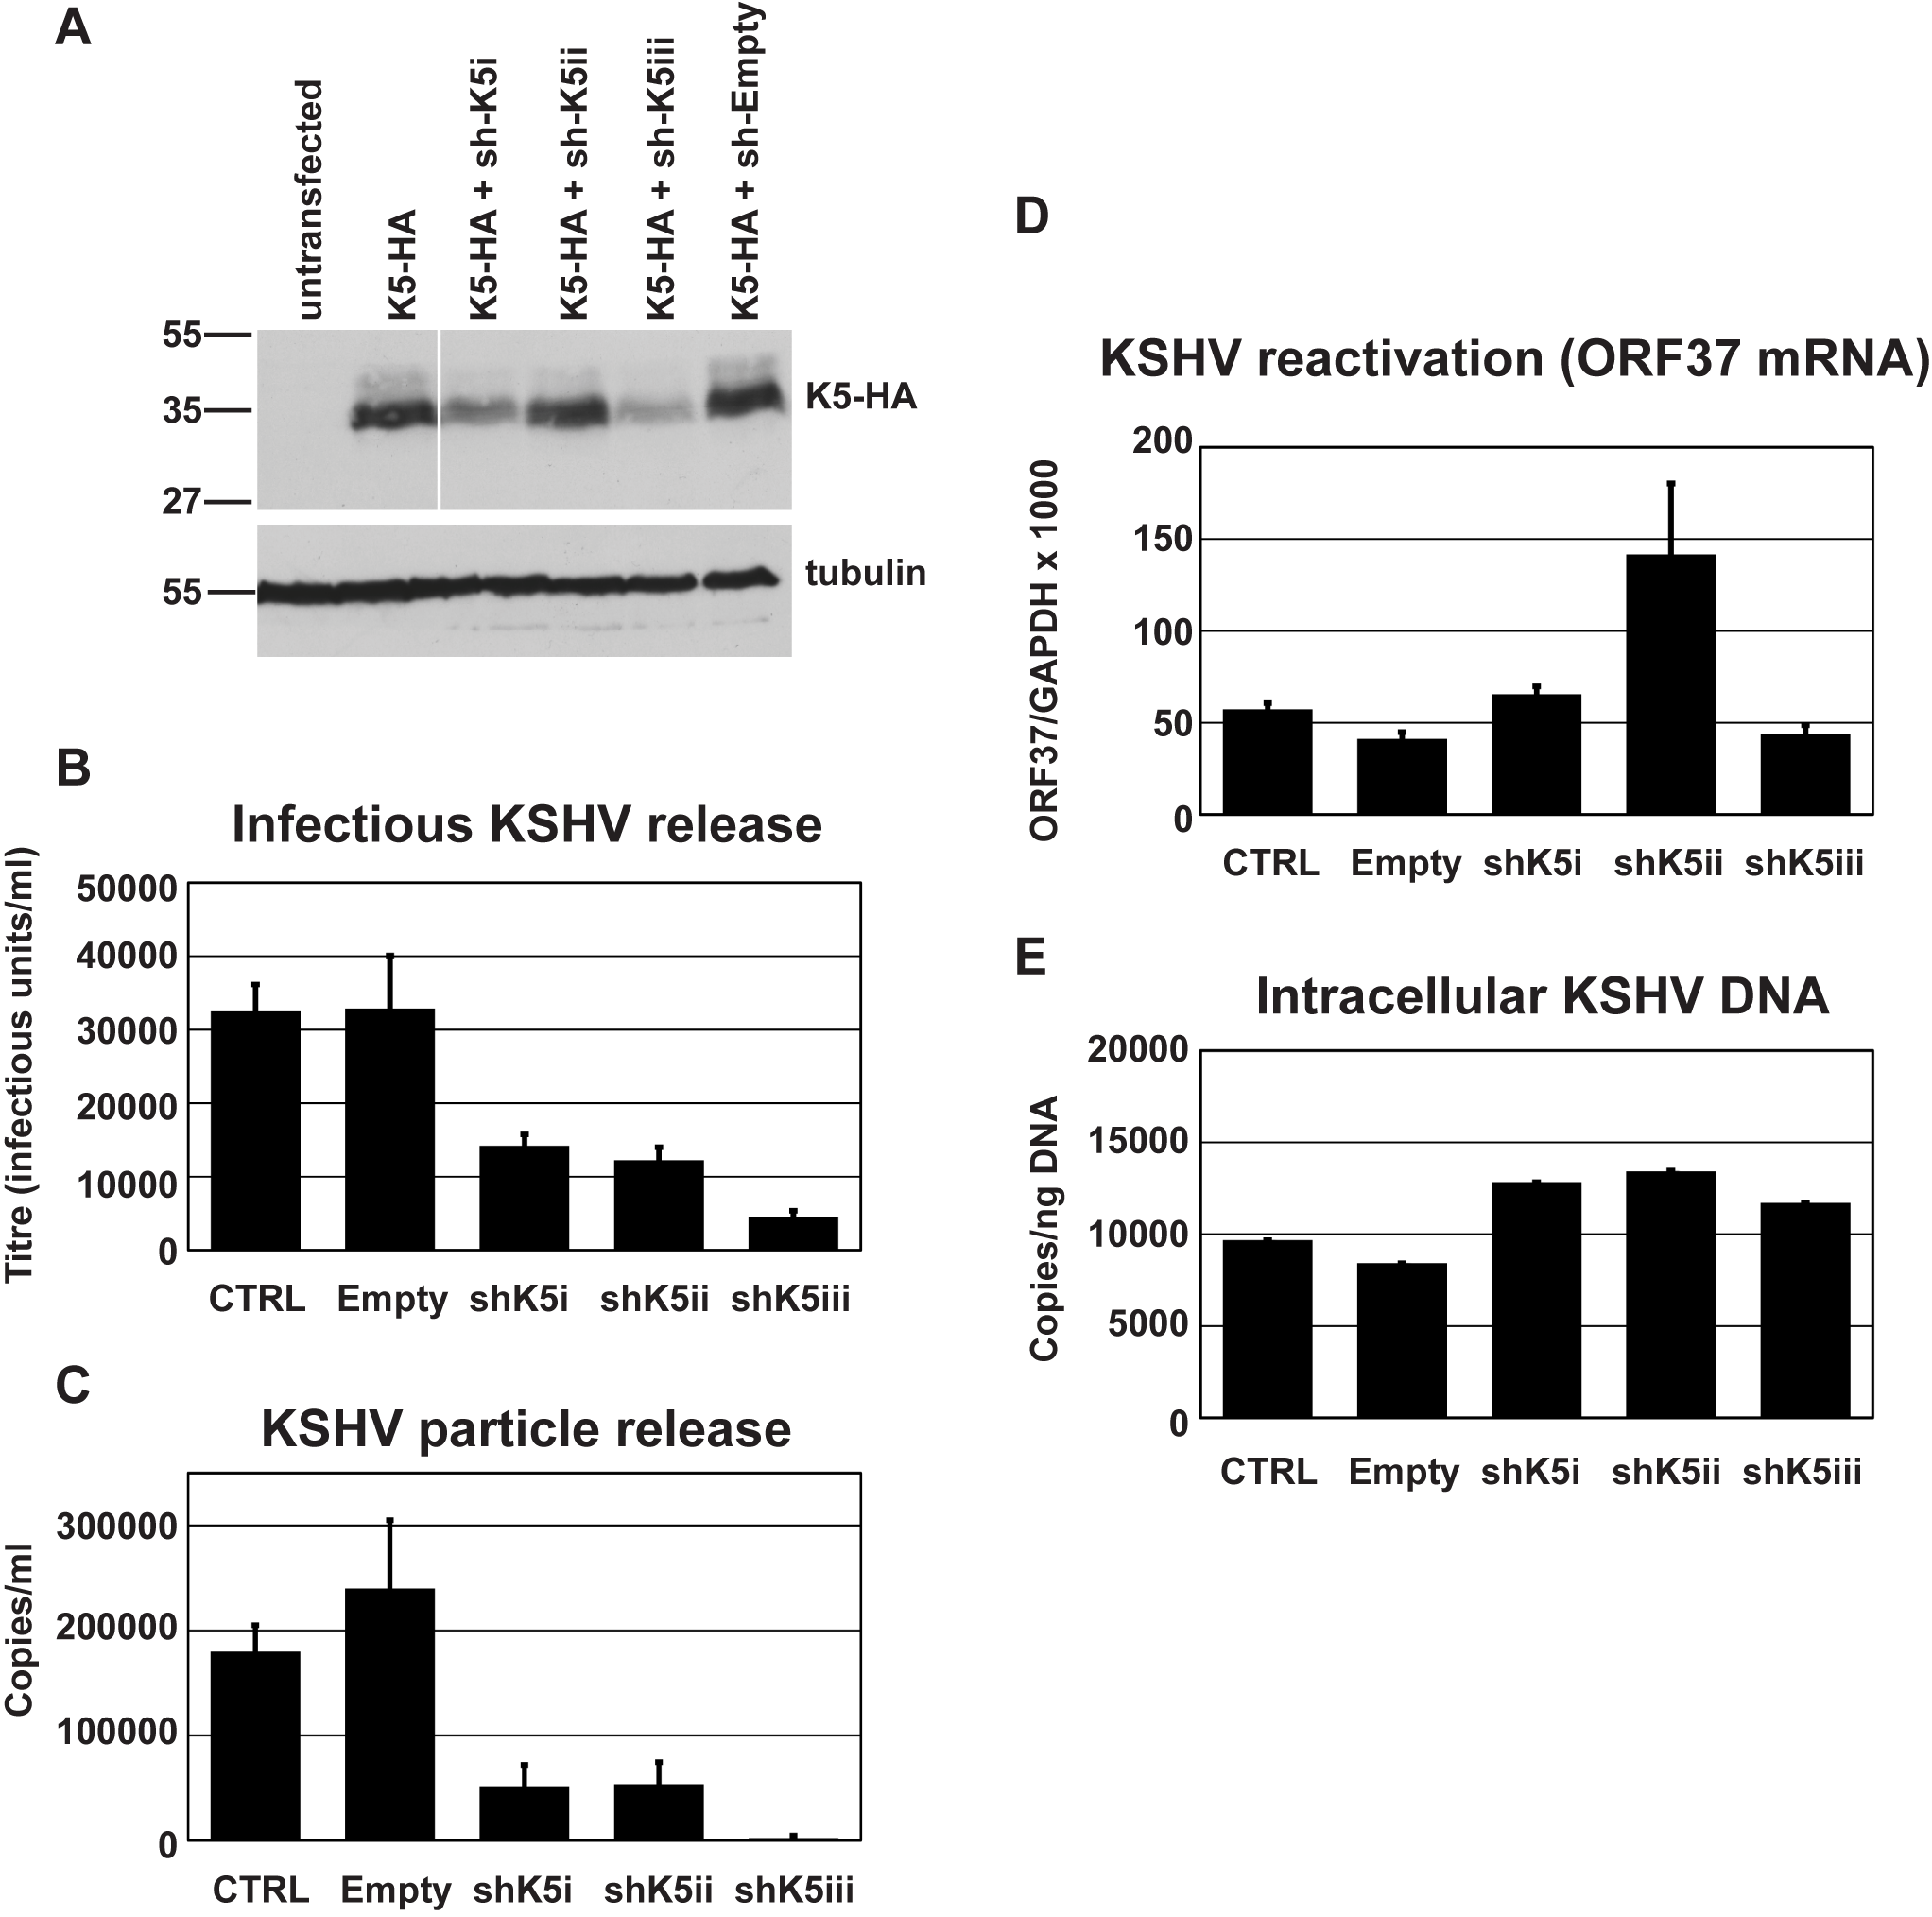 RNAi-depletion of K5 during lytic replication suppresses KSHV particle release.